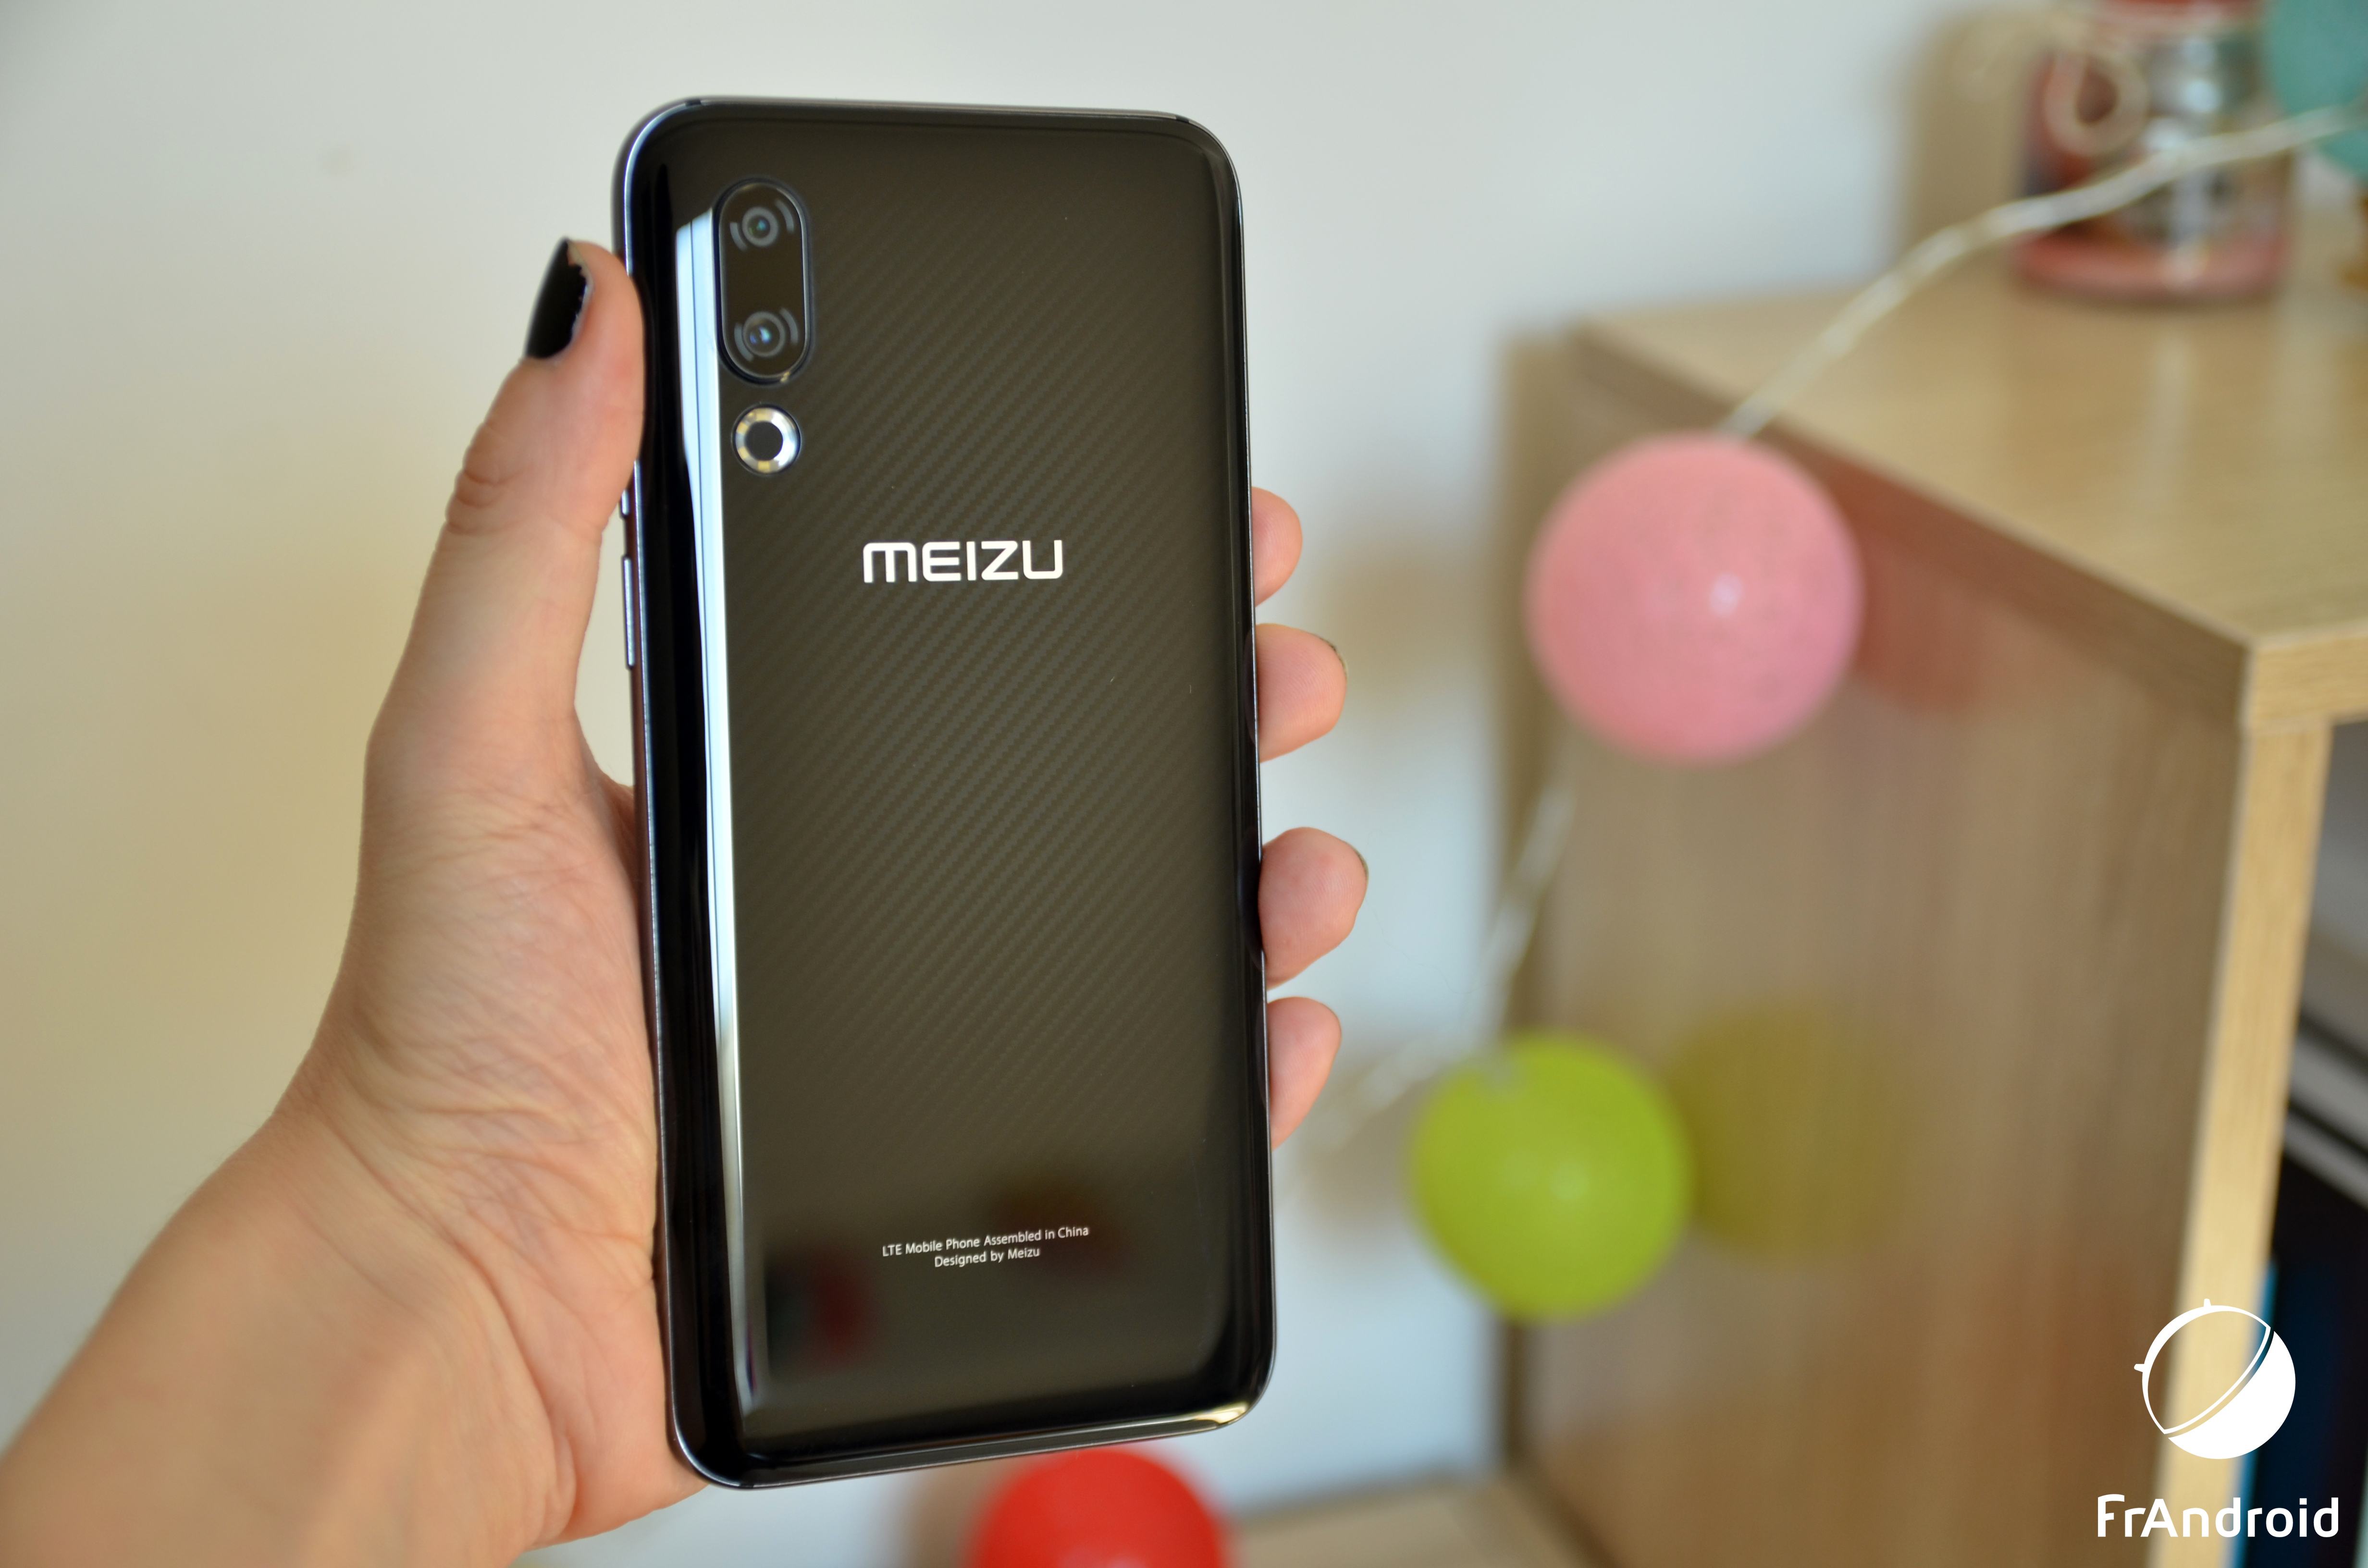 Test Meizu 16s : notre avis complet - Smartphones - FrAndroid